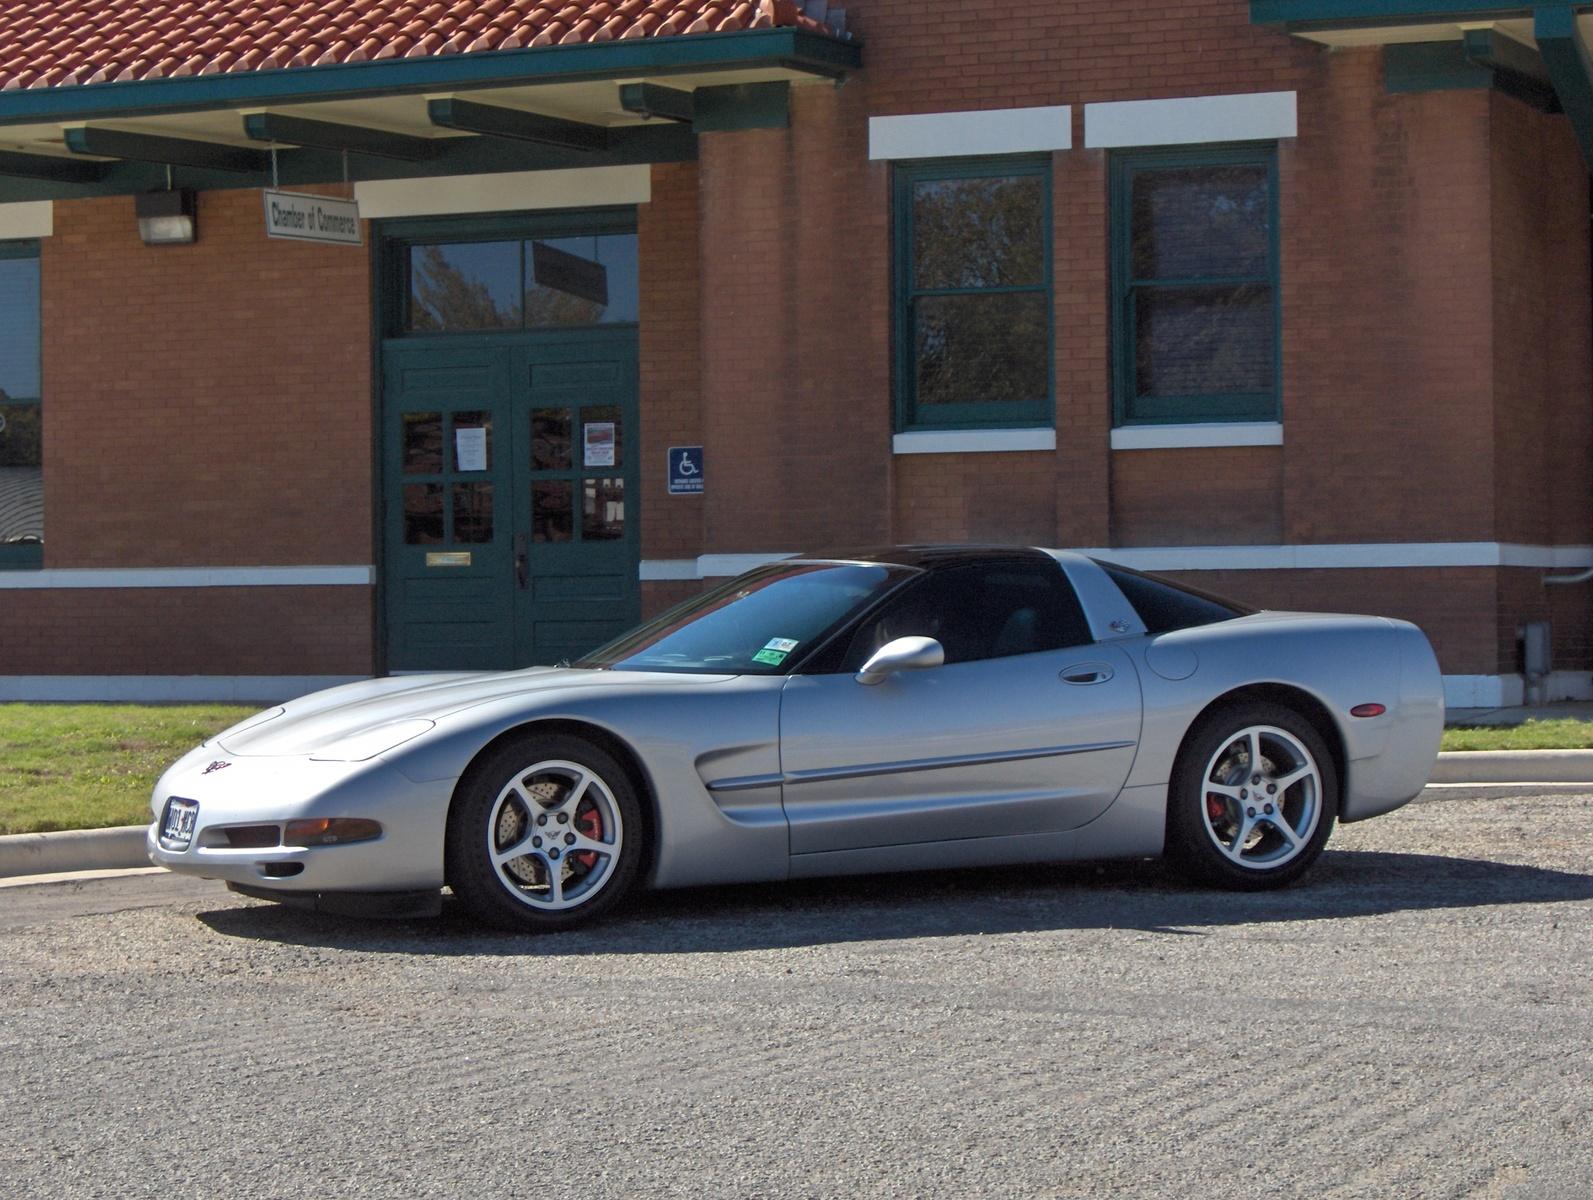 site2008042318212000 chevrolet corvette coupe pic 14788jpeg 1593x1200